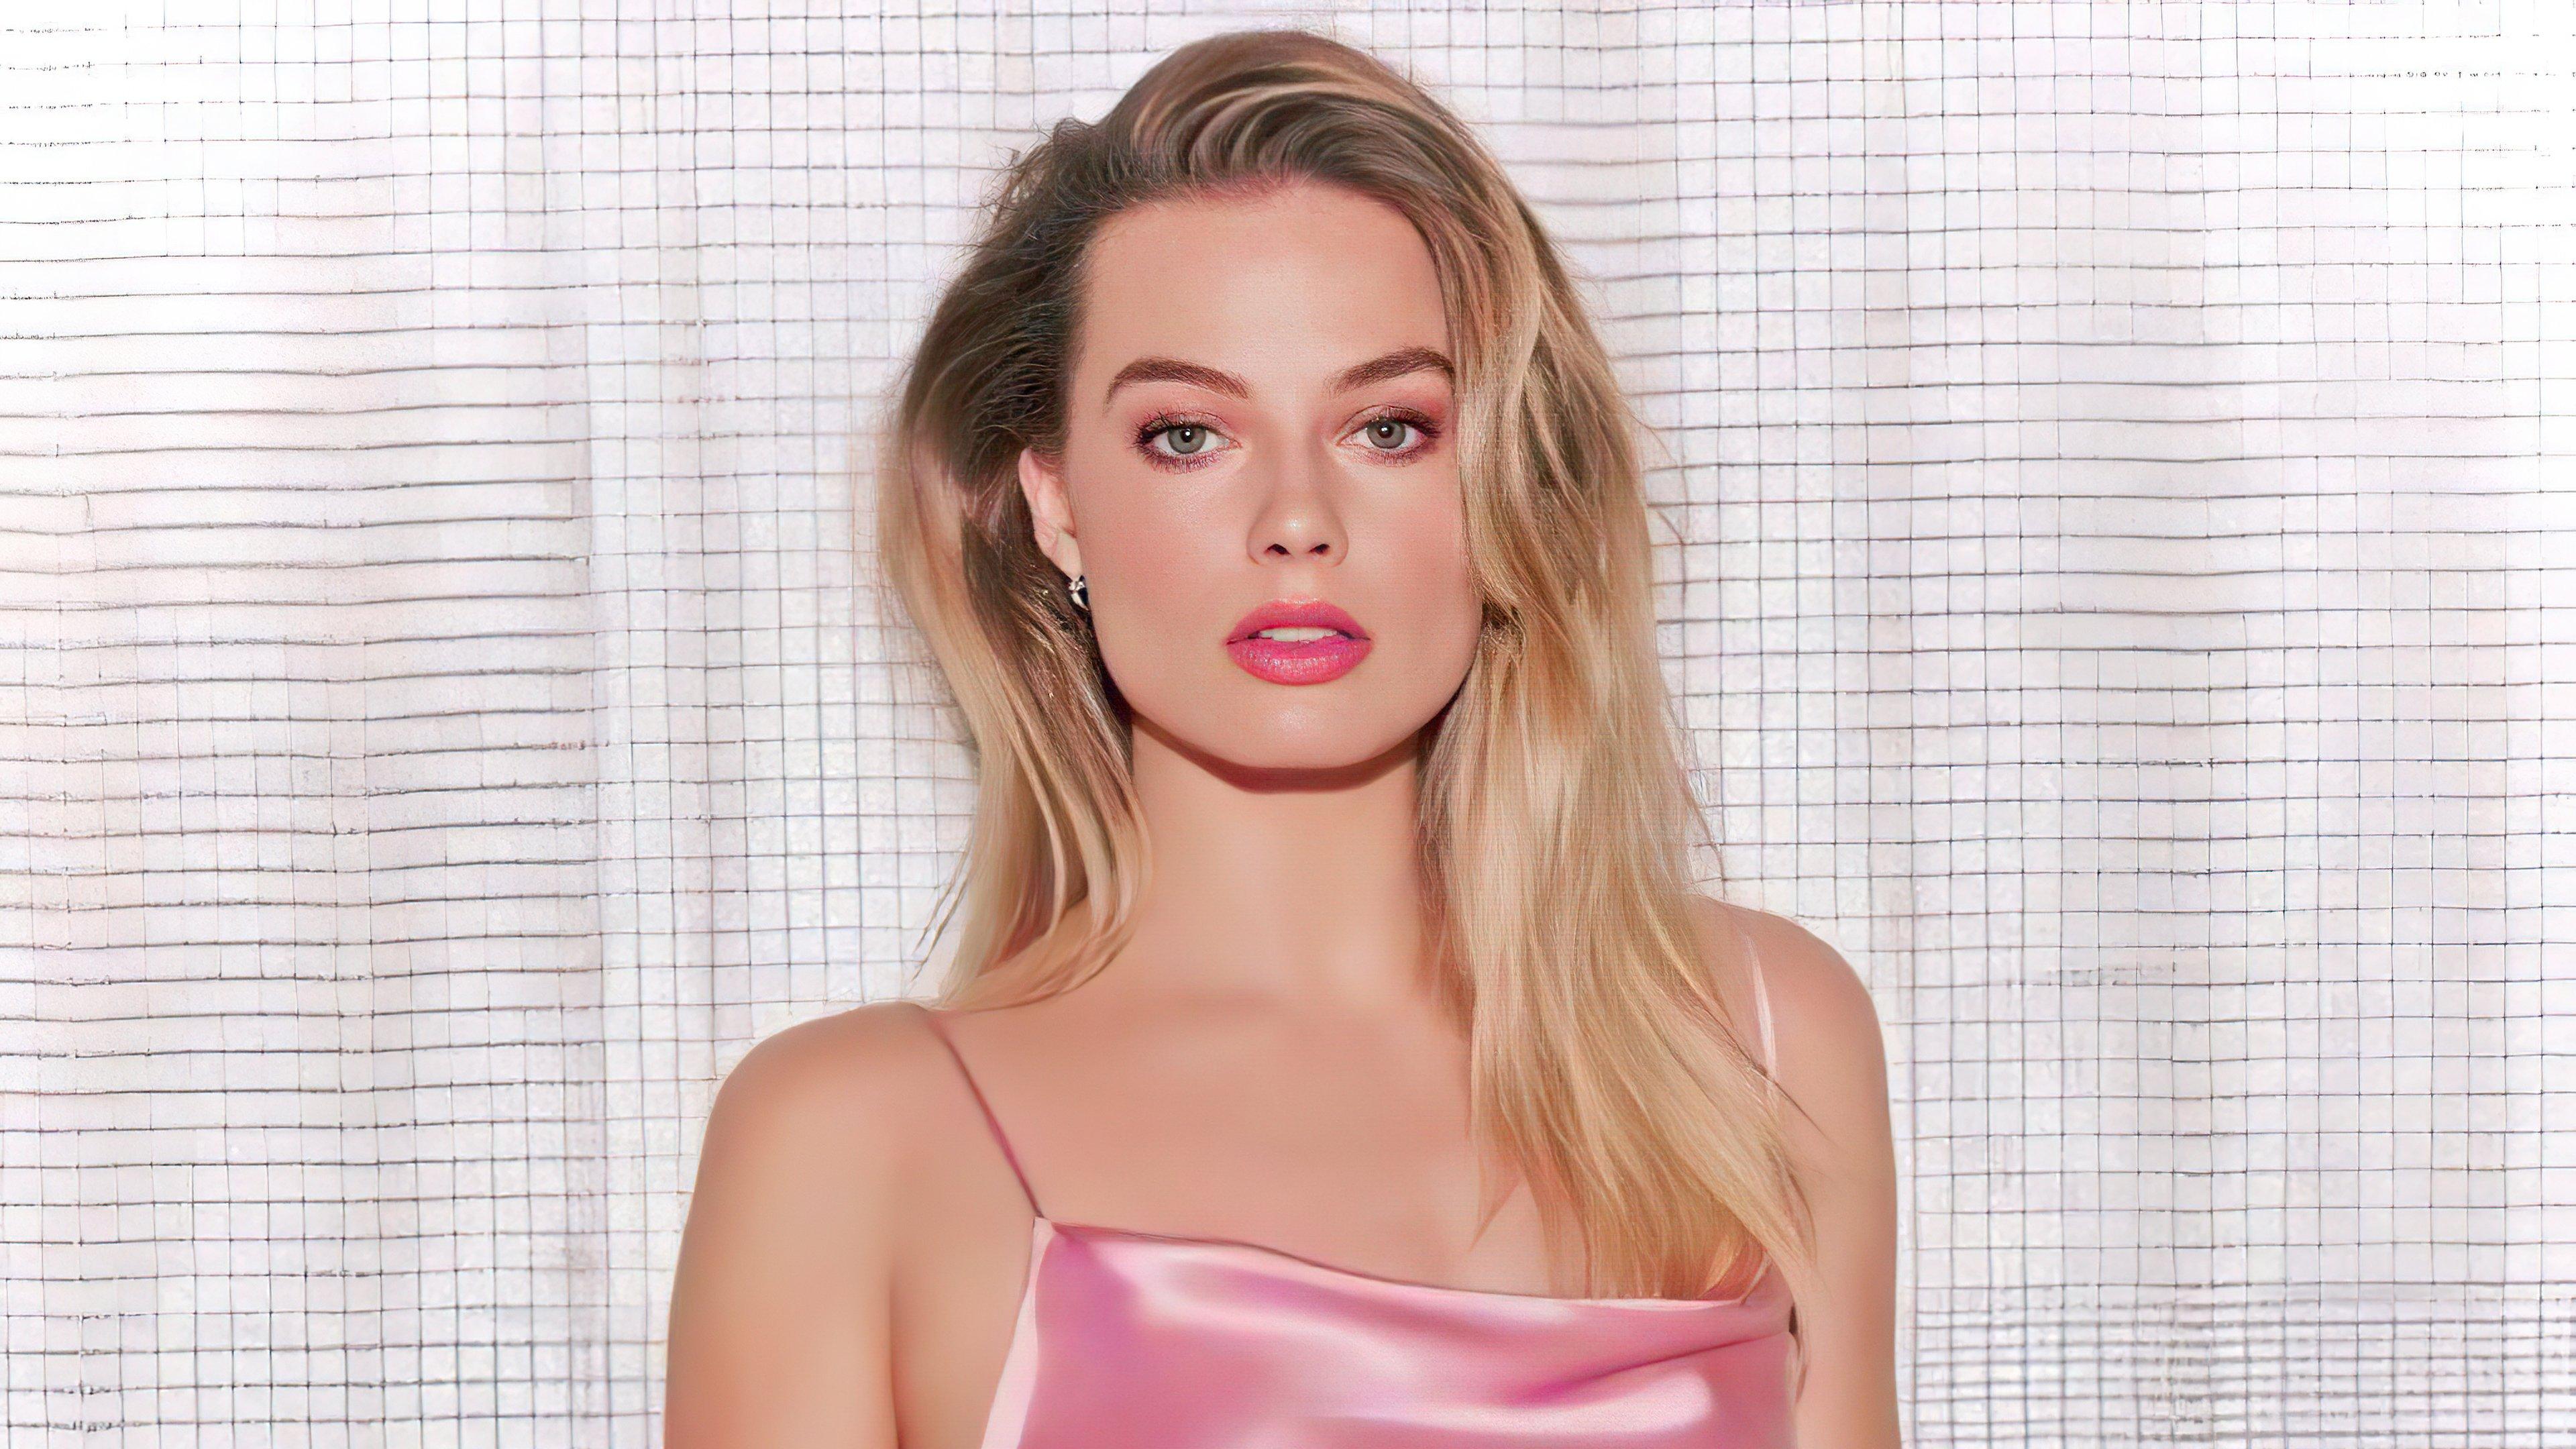 Wallpaper Margot Robbie in pink dress